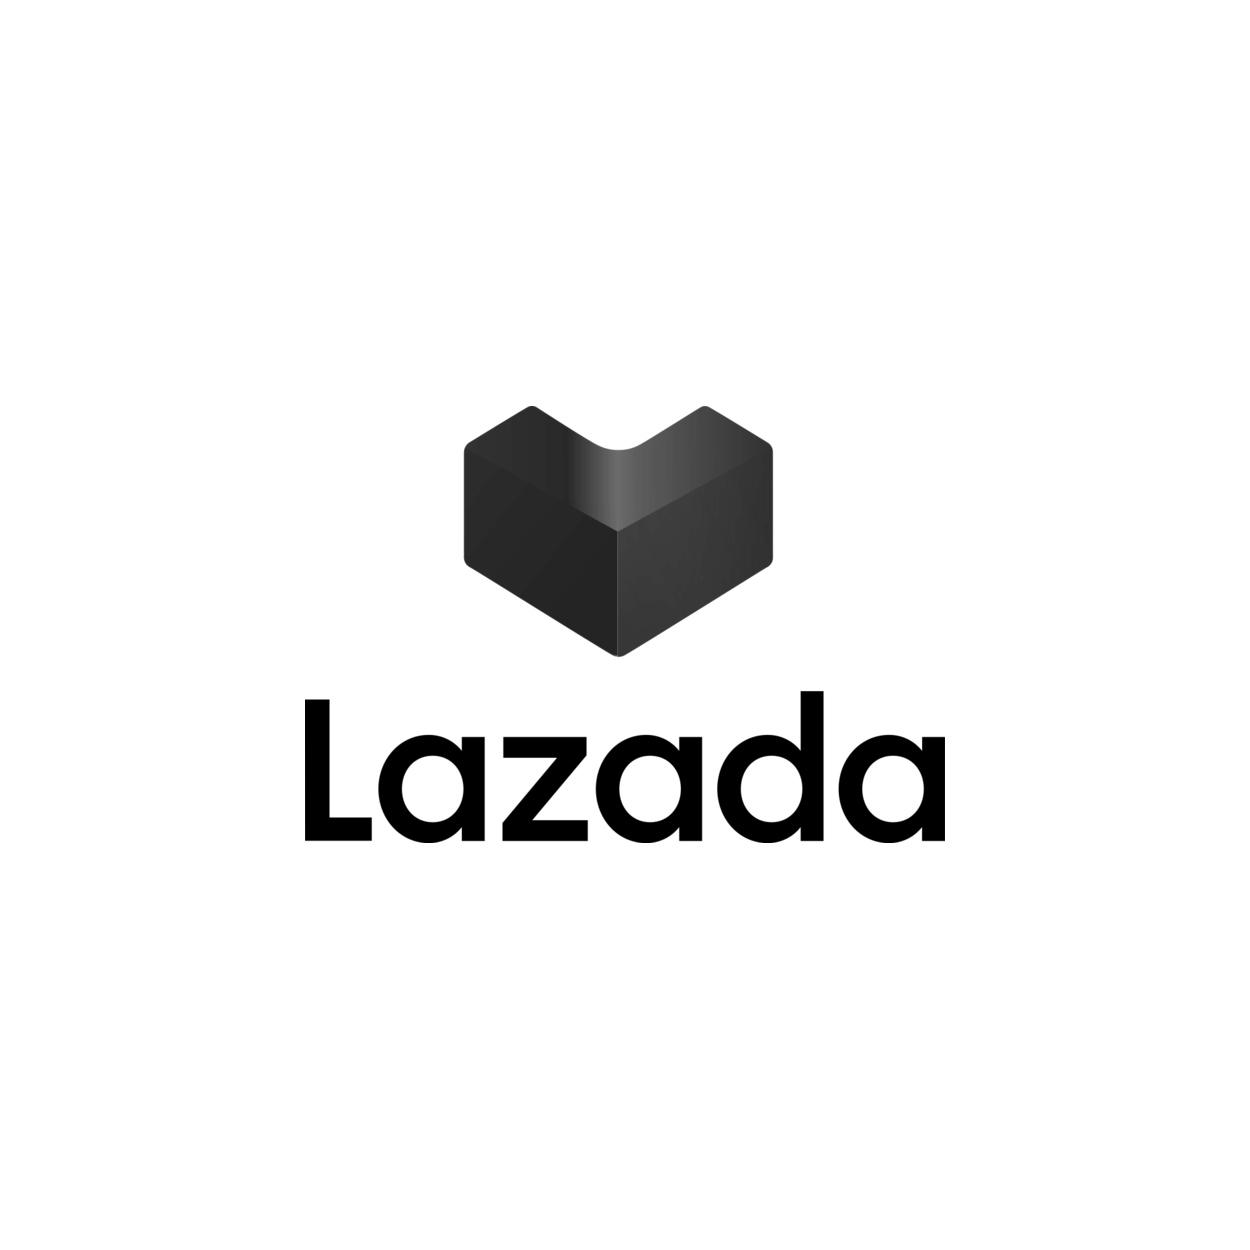 François Soulignac: LAZADA Group Southeast Asia - Digital Campaign - Creative Ideas - MADJOR Labbrand Shanghai